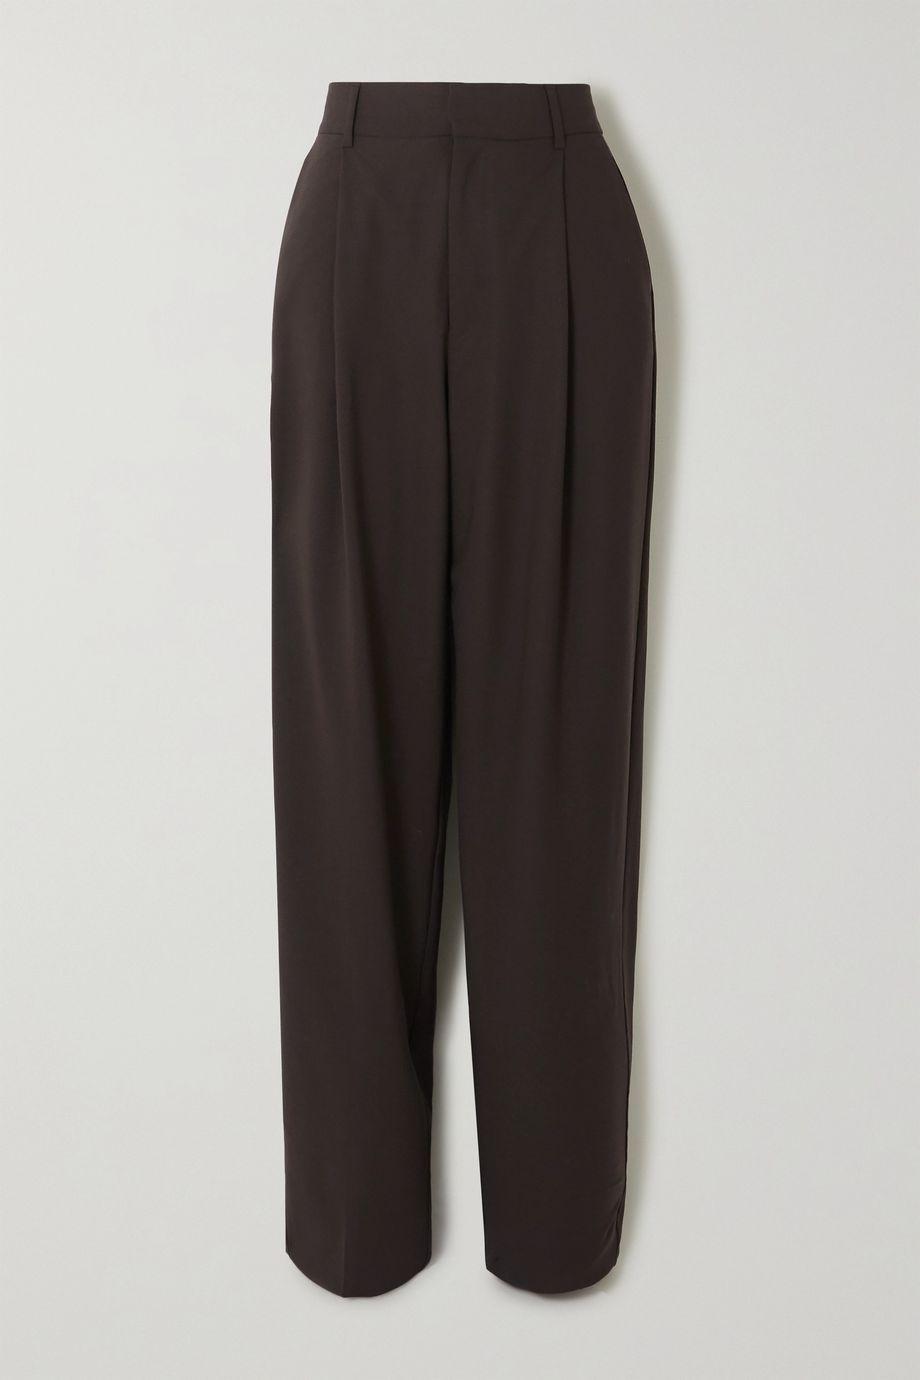 BITE Studios + NET SUSTAIN pleated organic wool-blend tapered pants